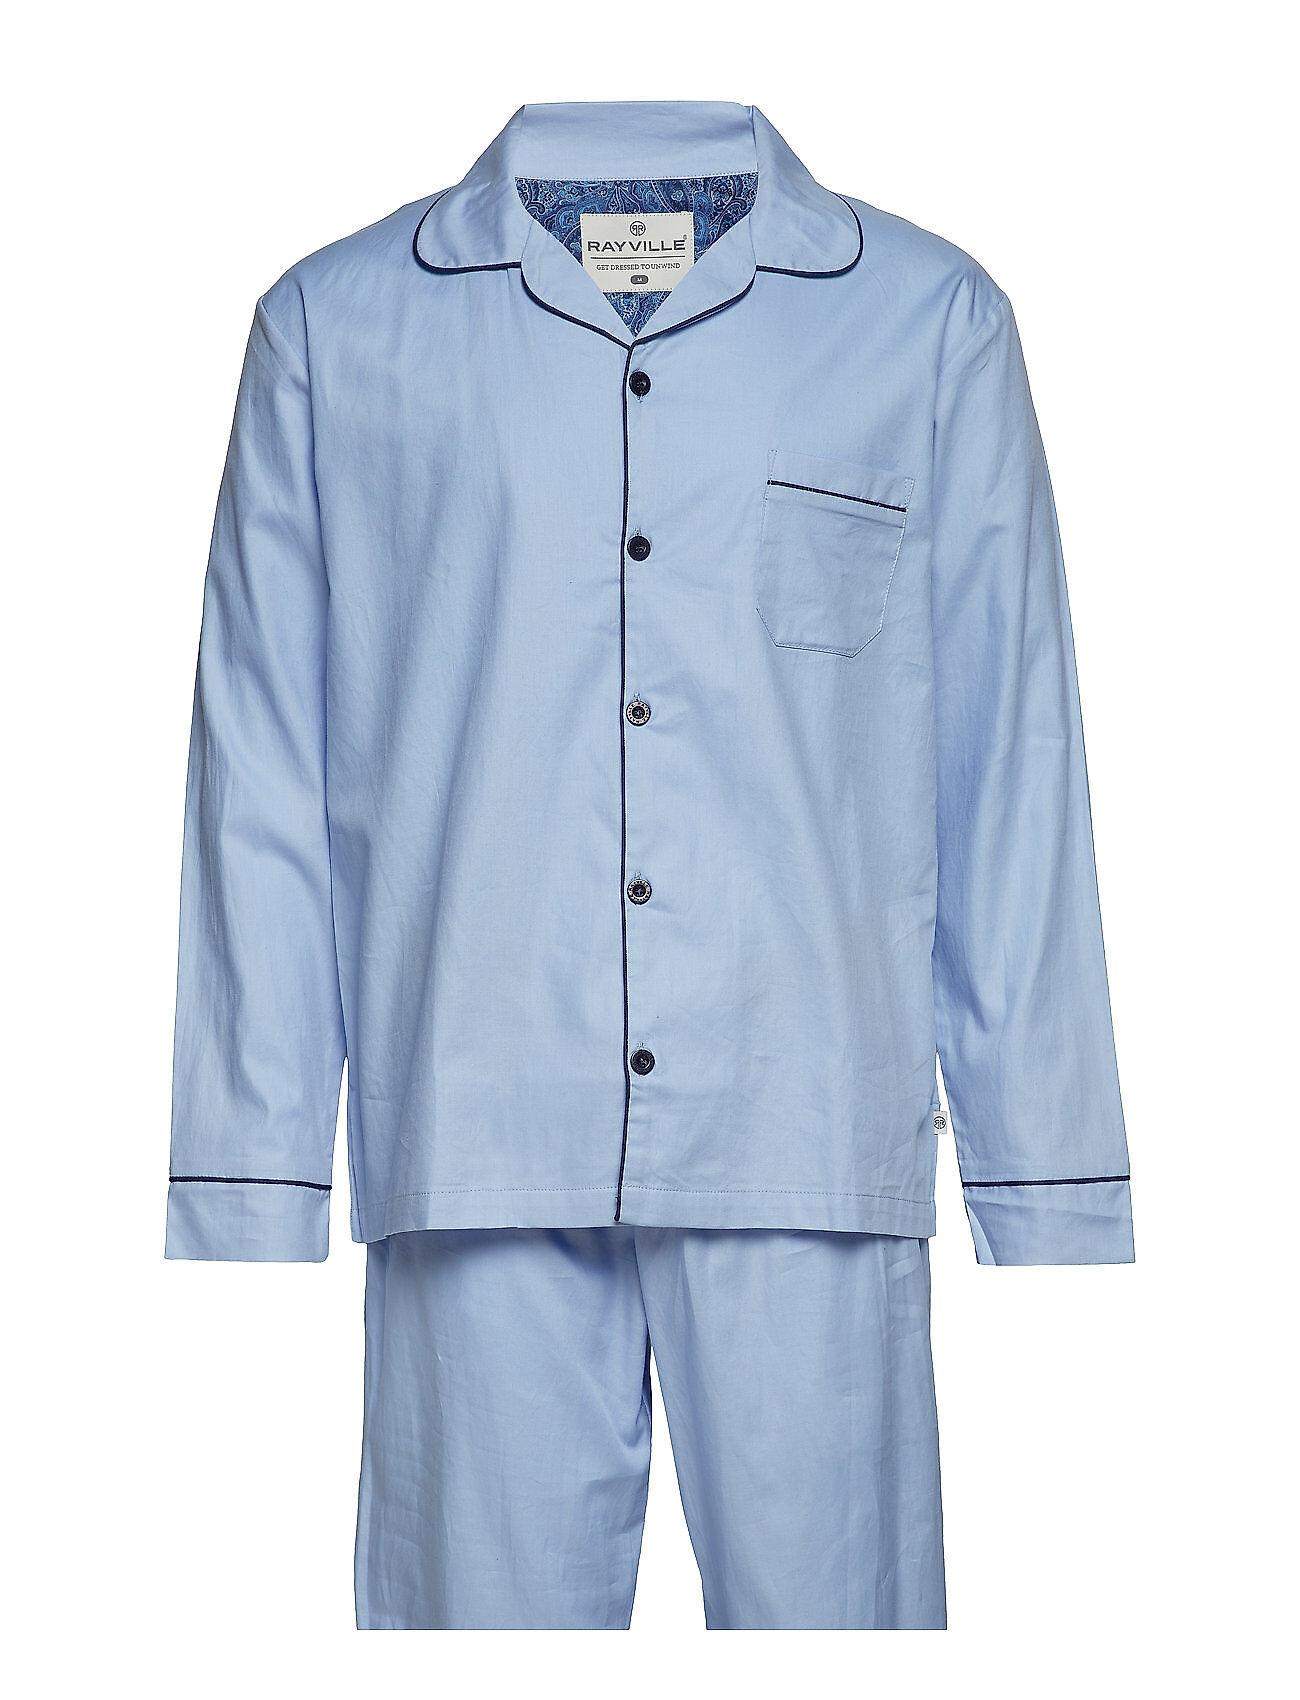 Rayville Mick Pyjamas Solid - Navy Blue - S